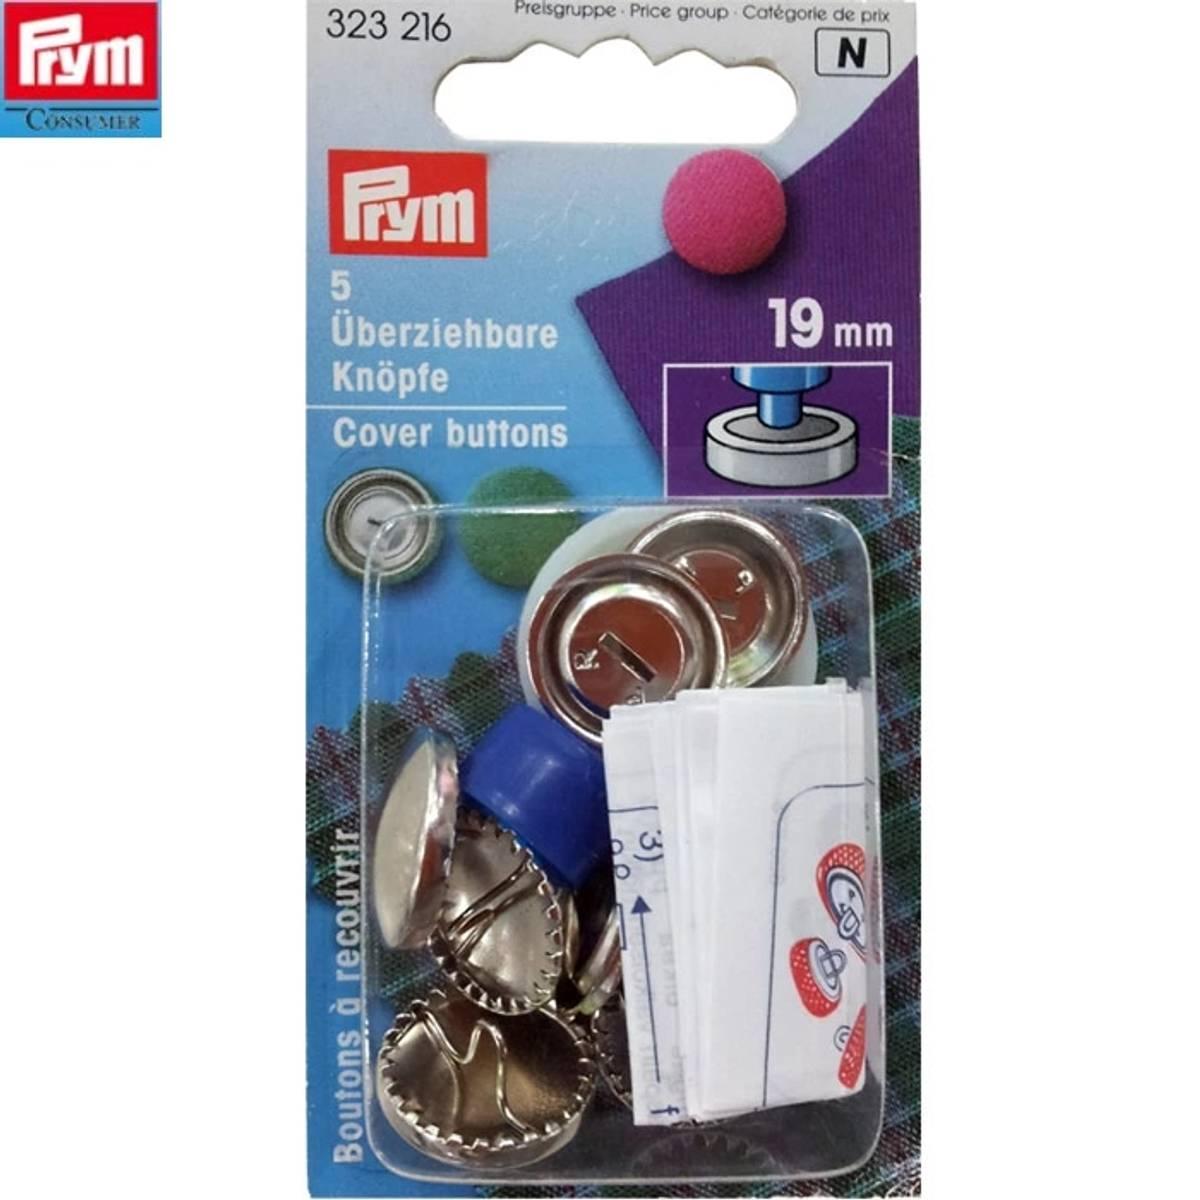 Prym Cover buttons 19mm 5stk sølv 323216